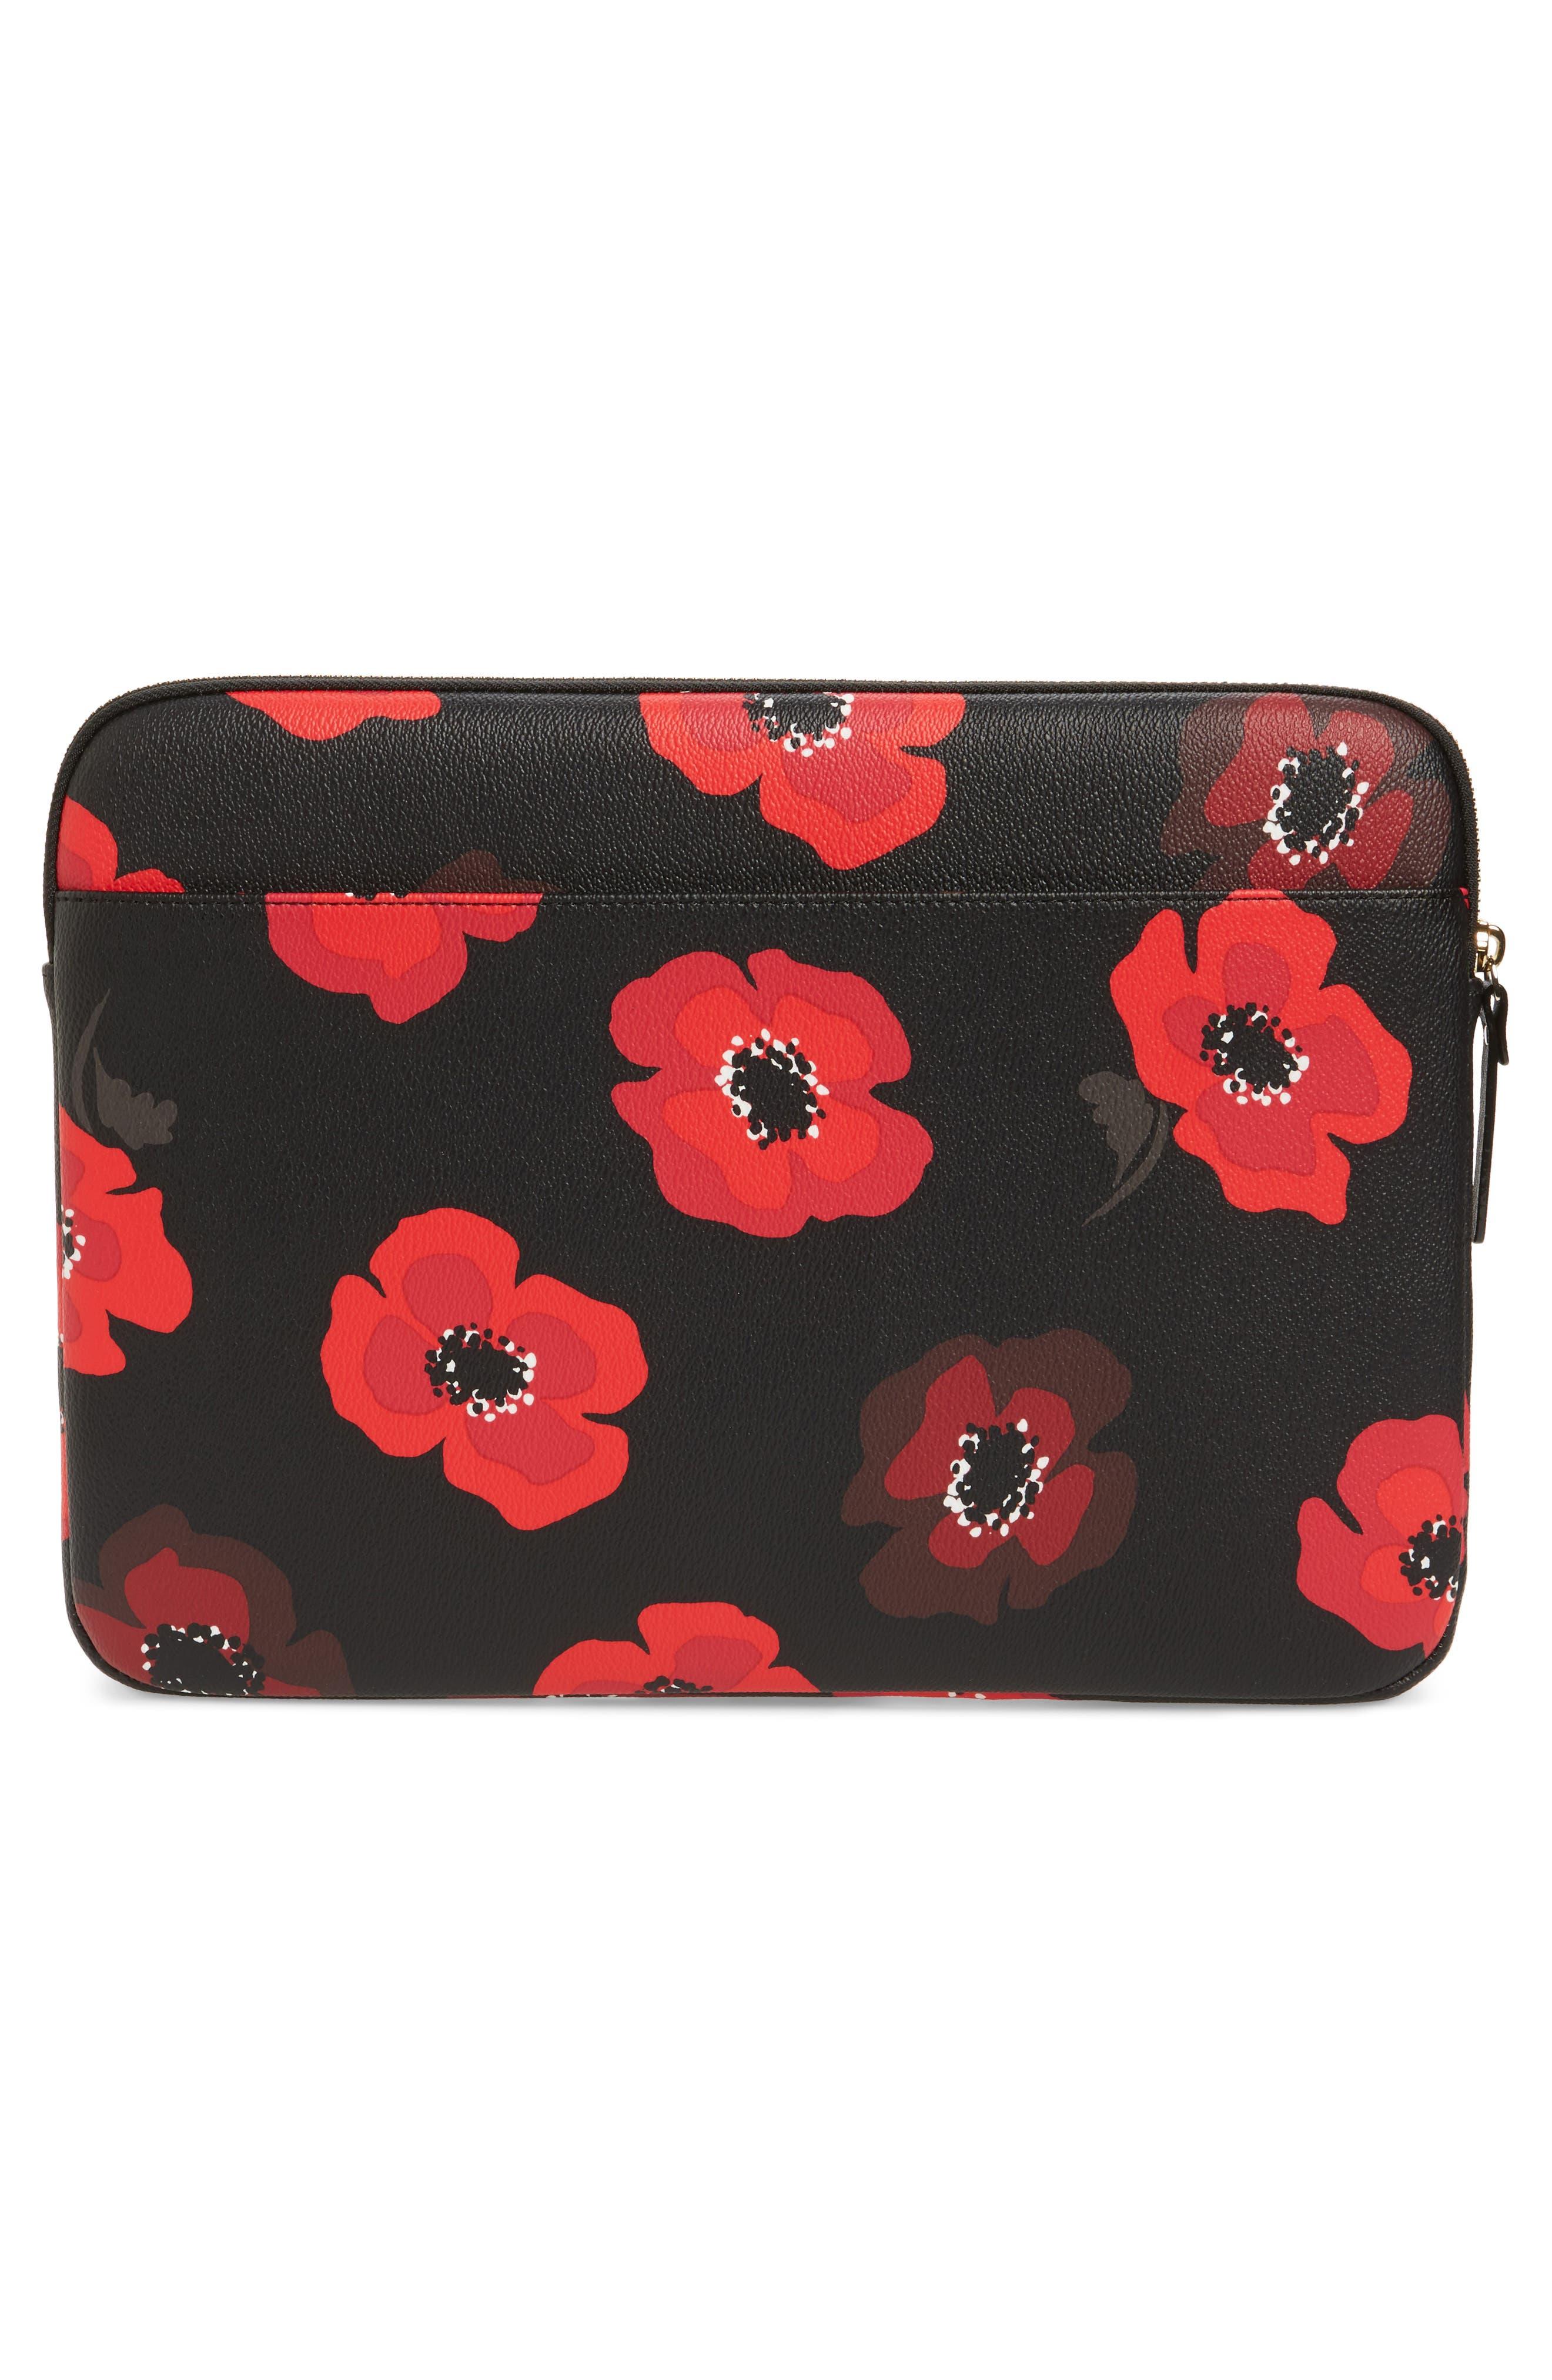 poppy 13-inch laptop sleeve,                             Alternate thumbnail 4, color,                             002